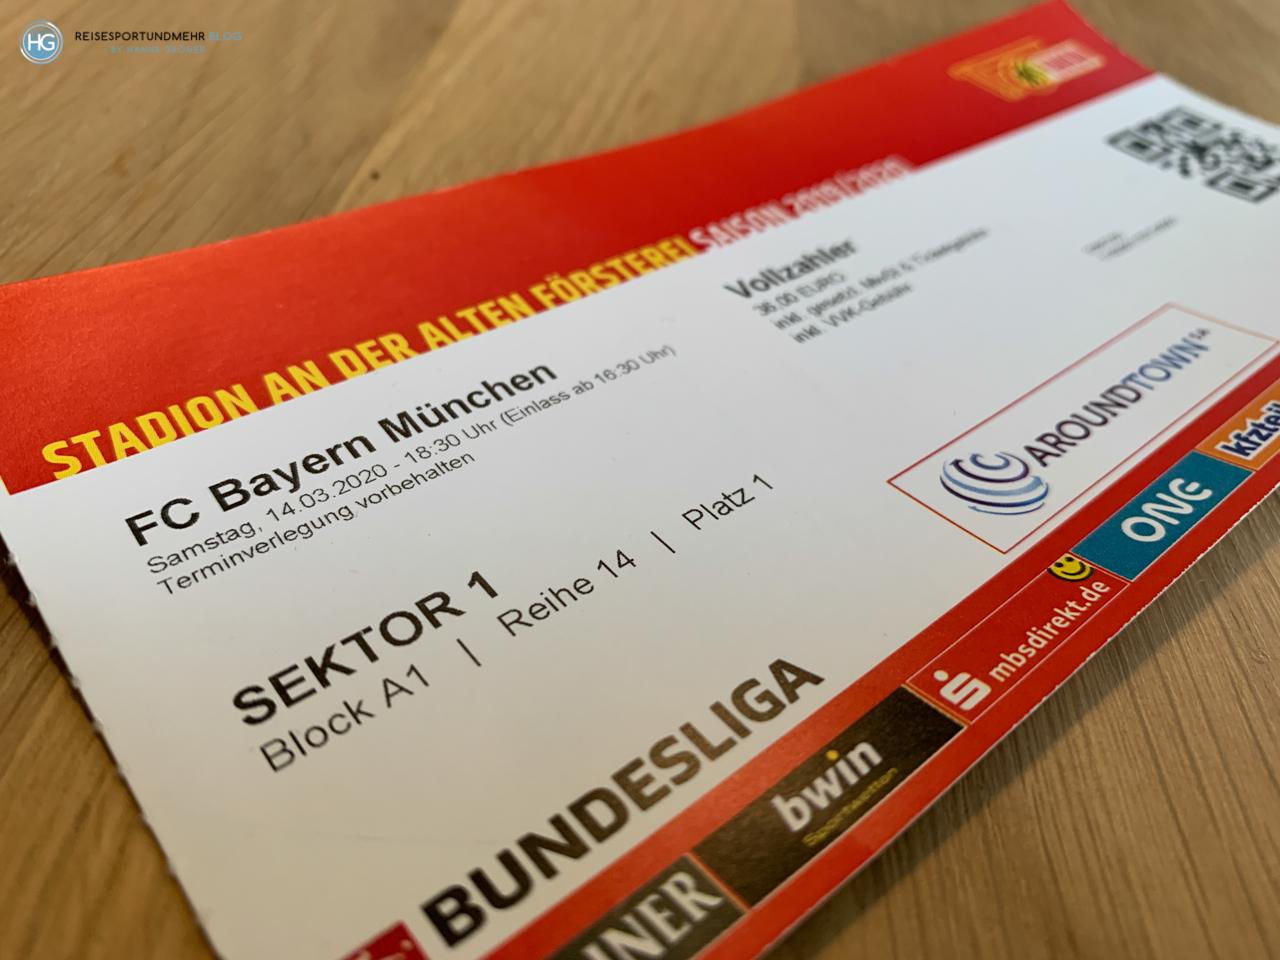 Stadionticket Union Berlin - Bayern 2020